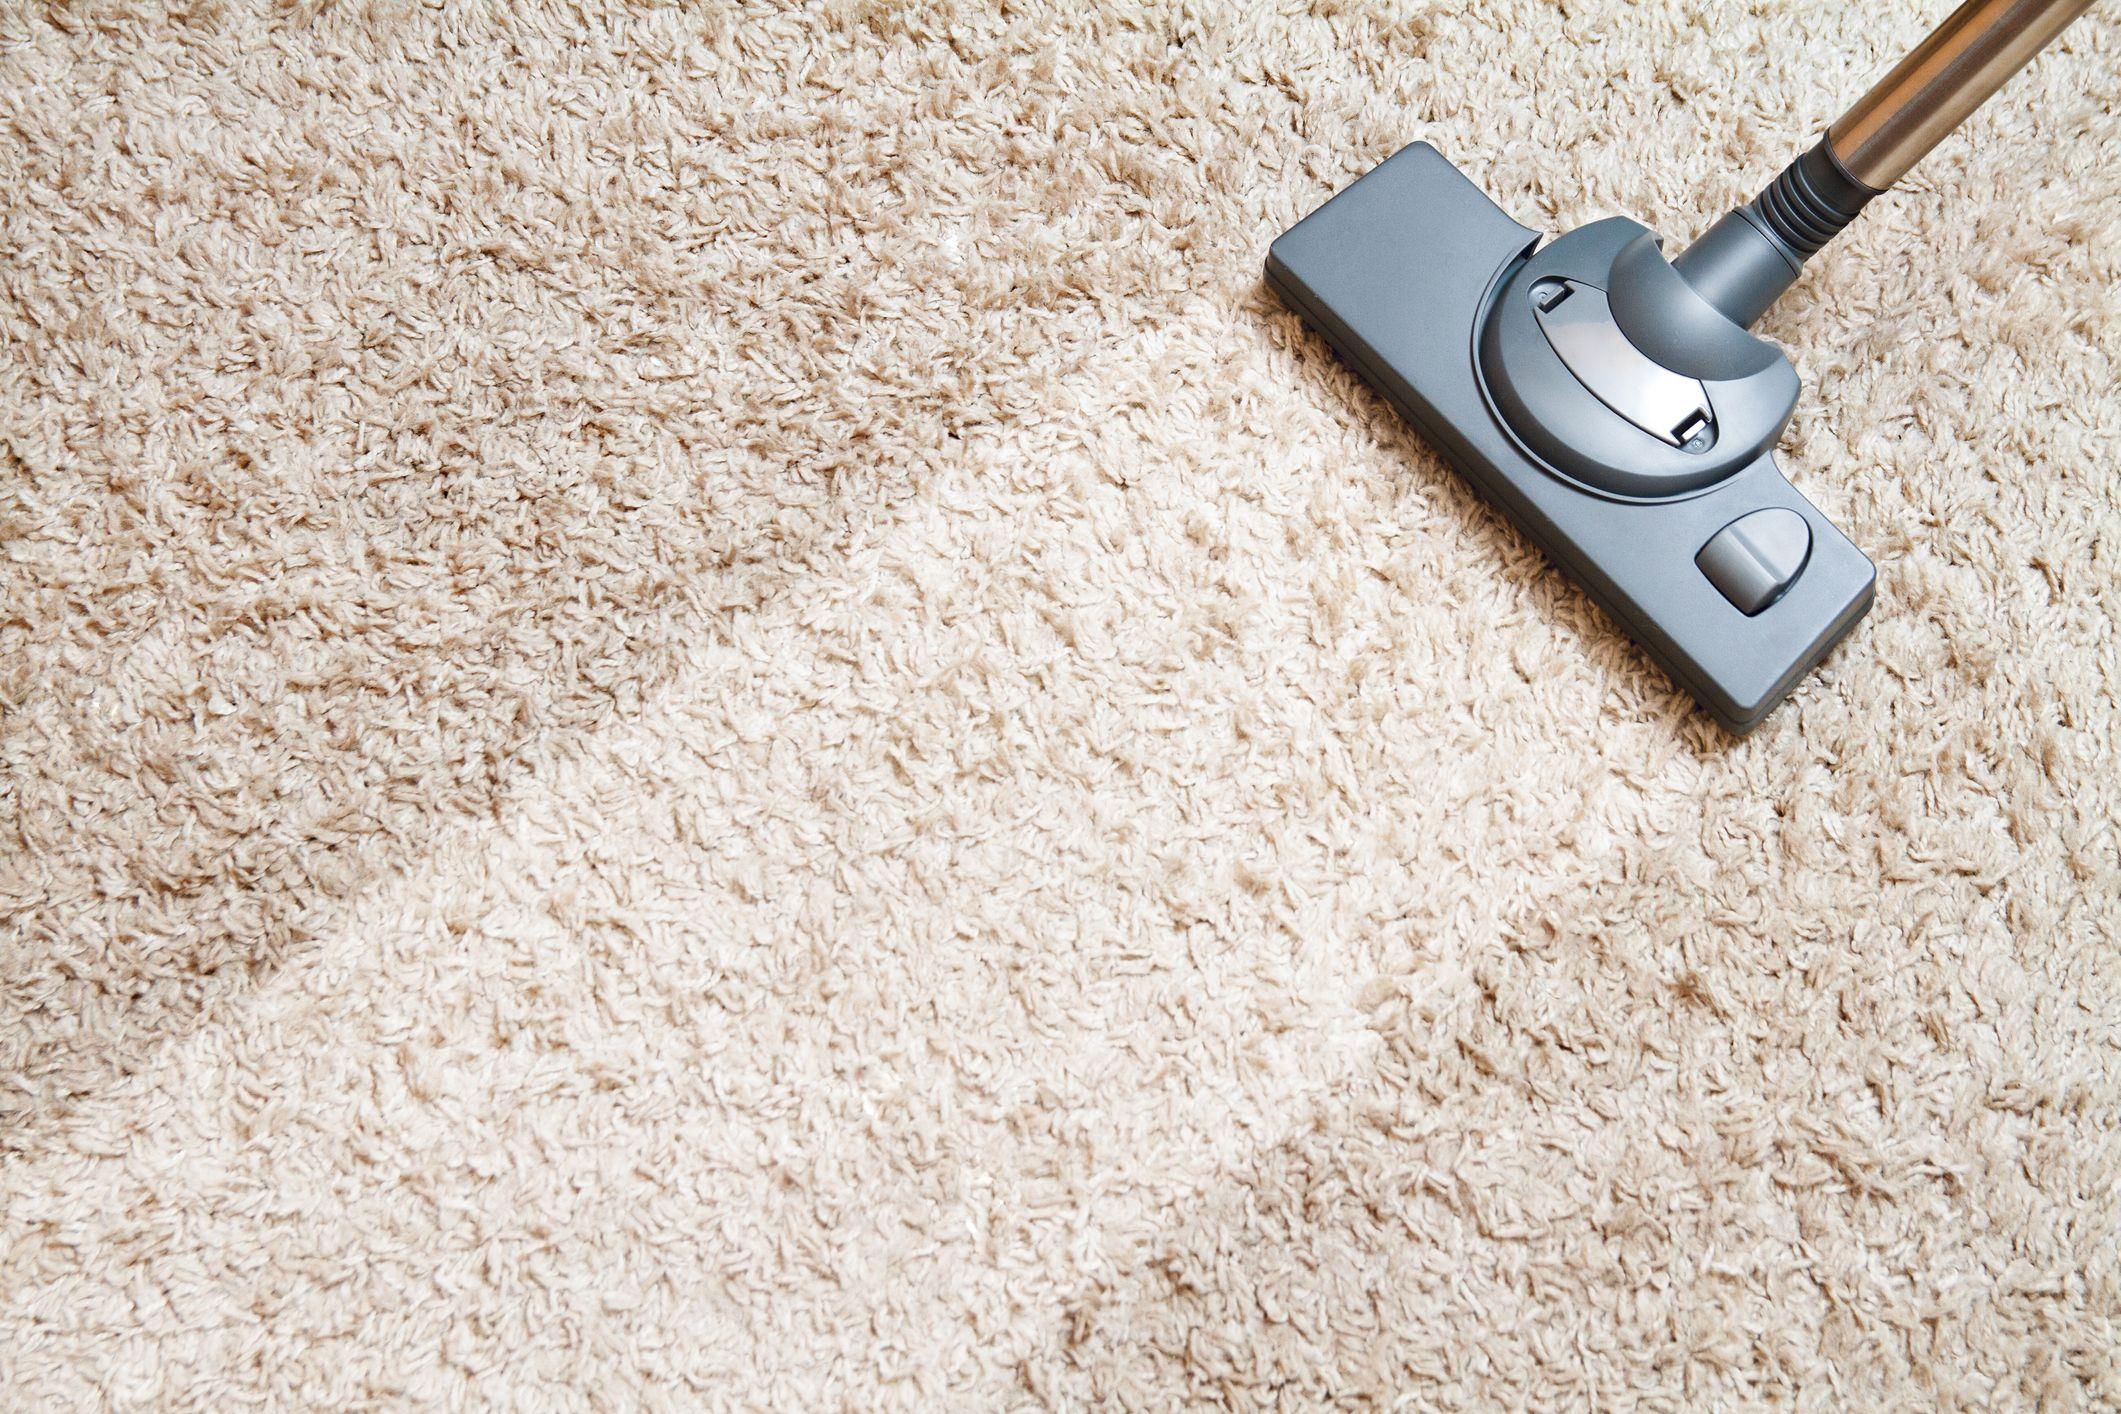 Best vacuum cleaners to buy - best